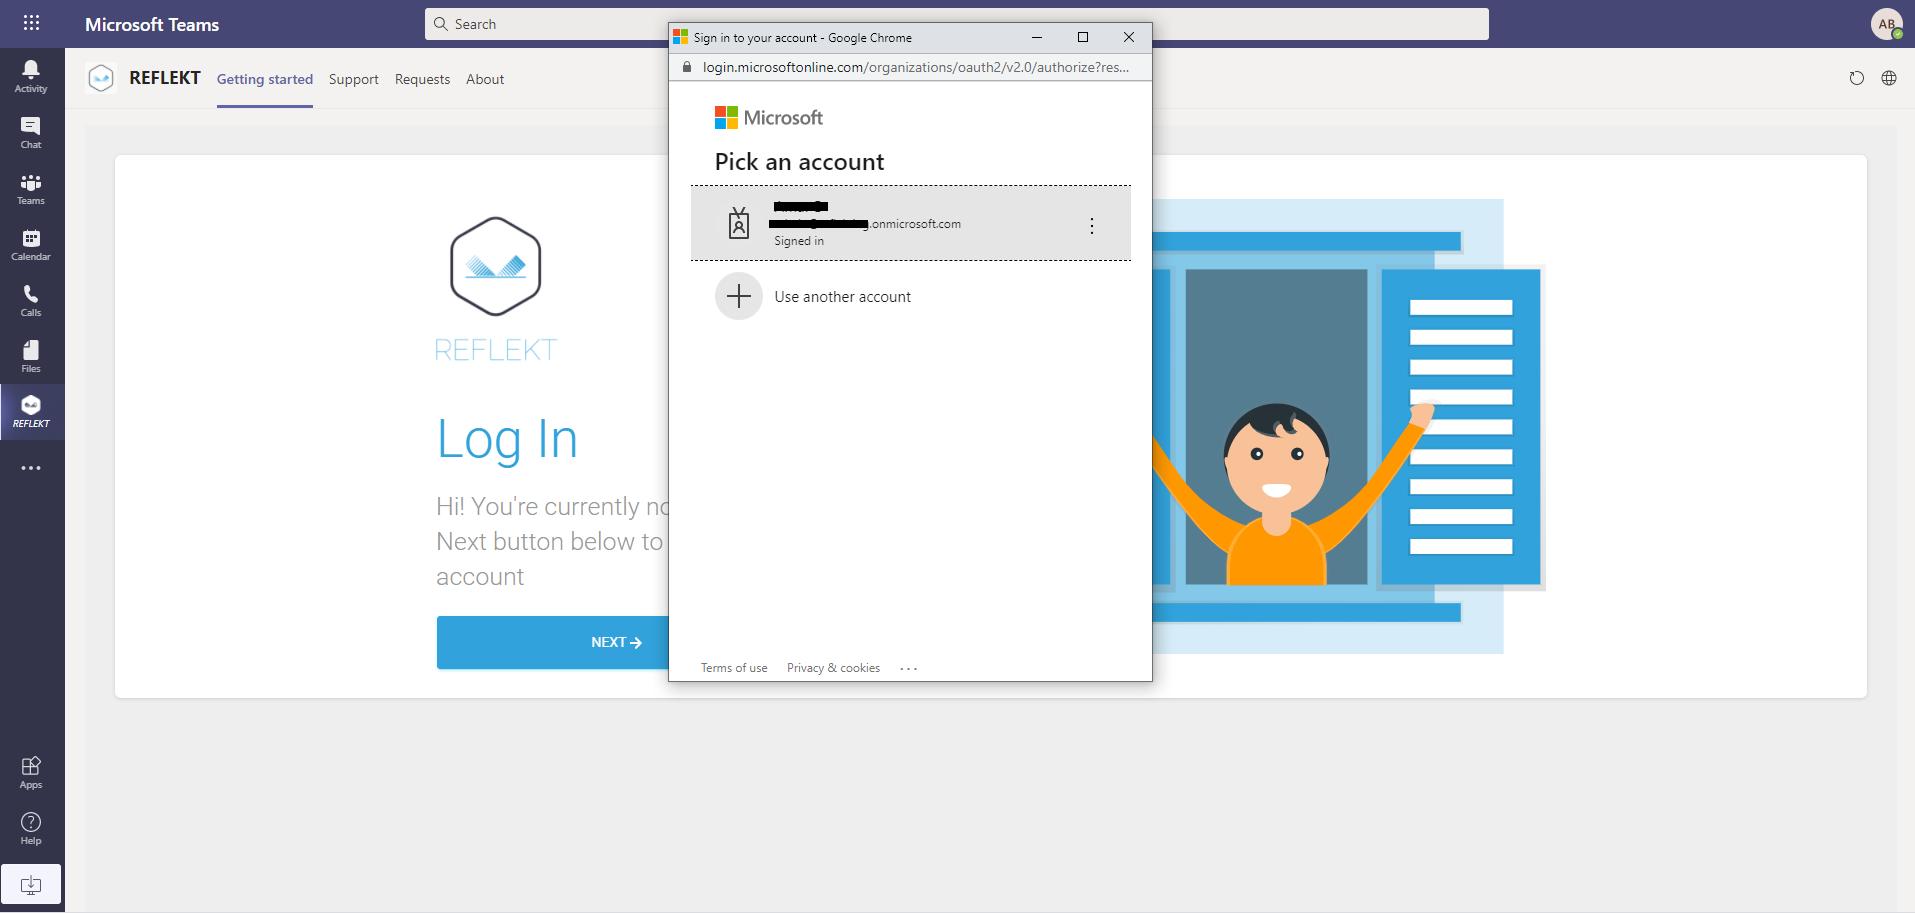 Microsoft Teams Install Add Reflekt